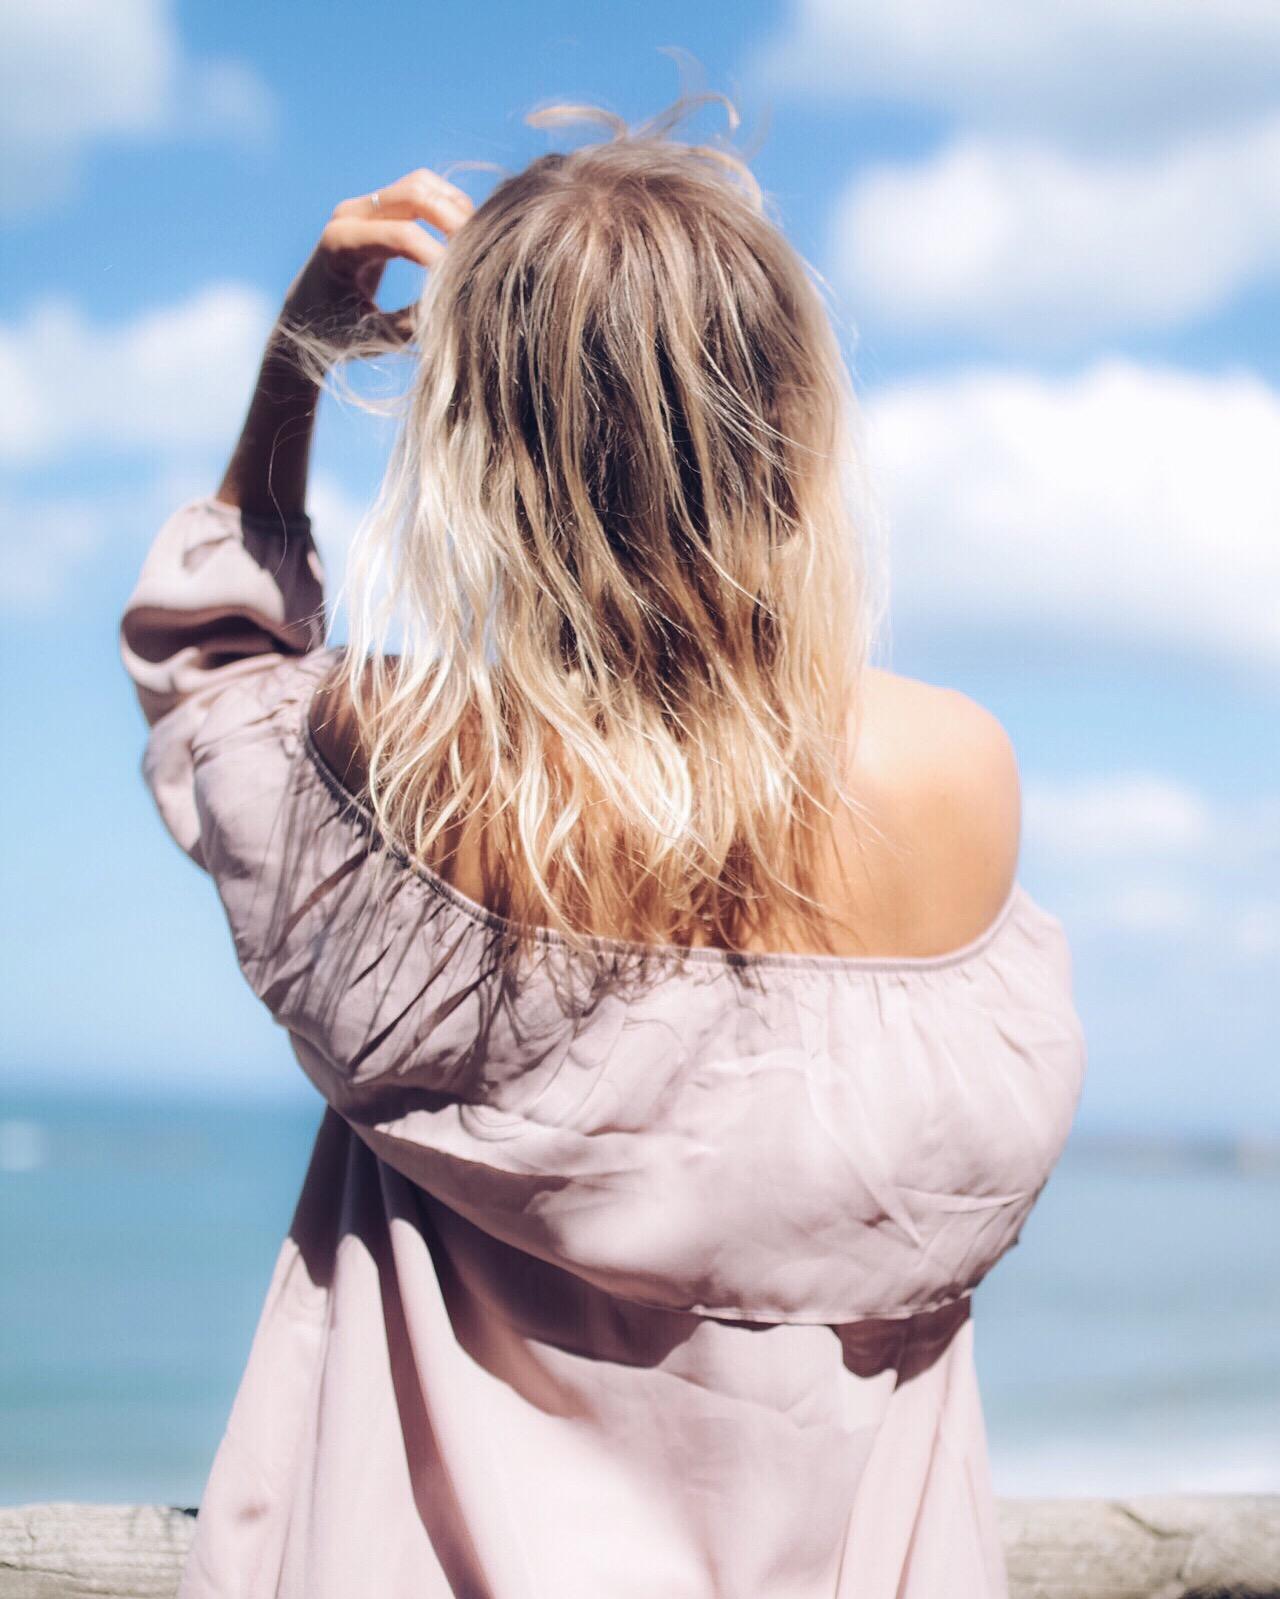 Robe rose épaules dénudées I Sp4nkblog